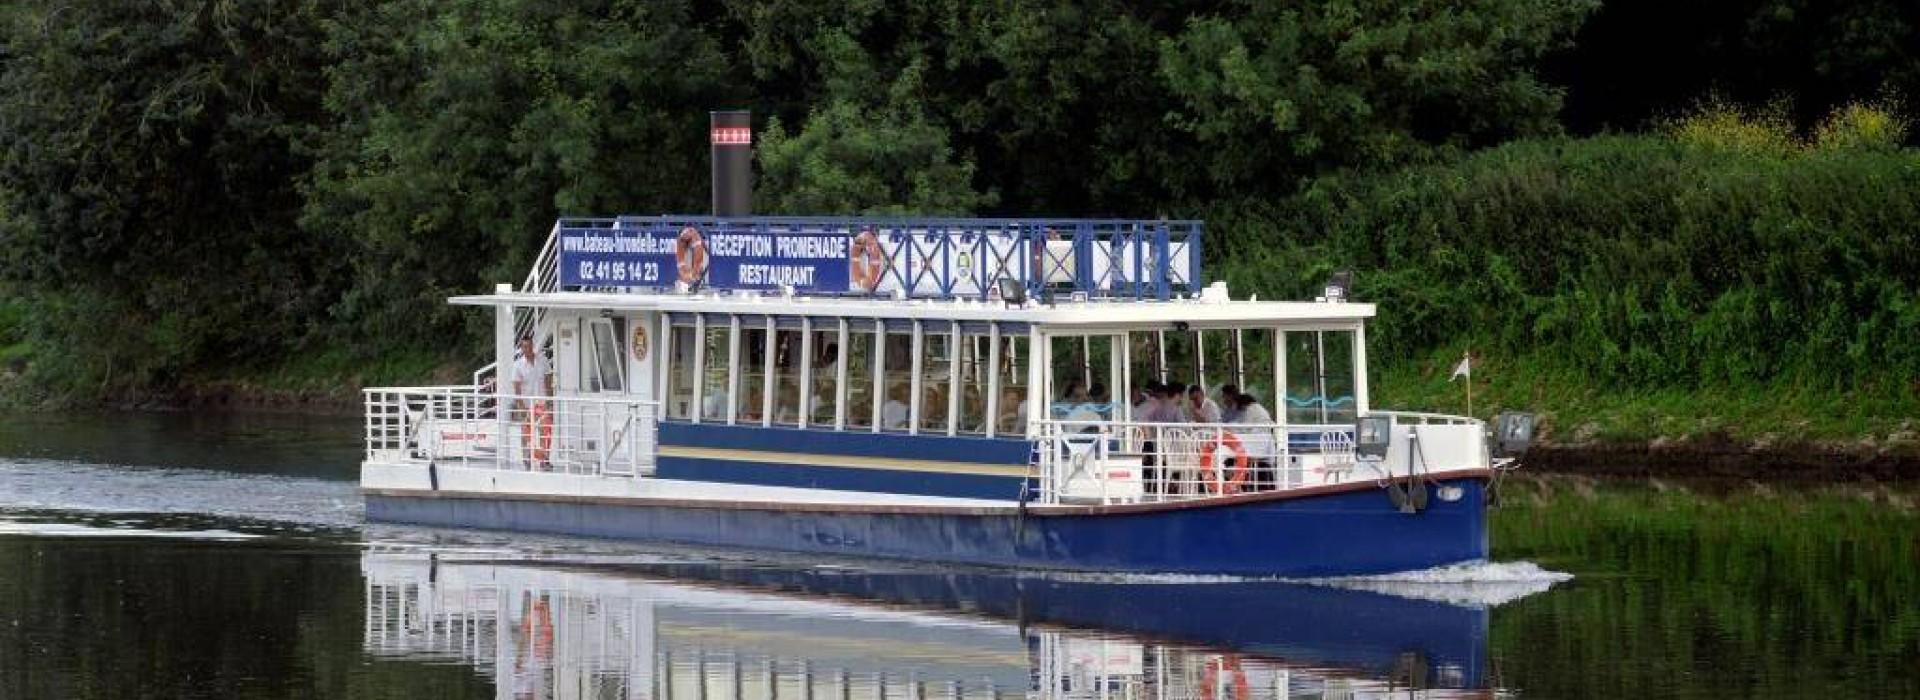 promenade bateau angers